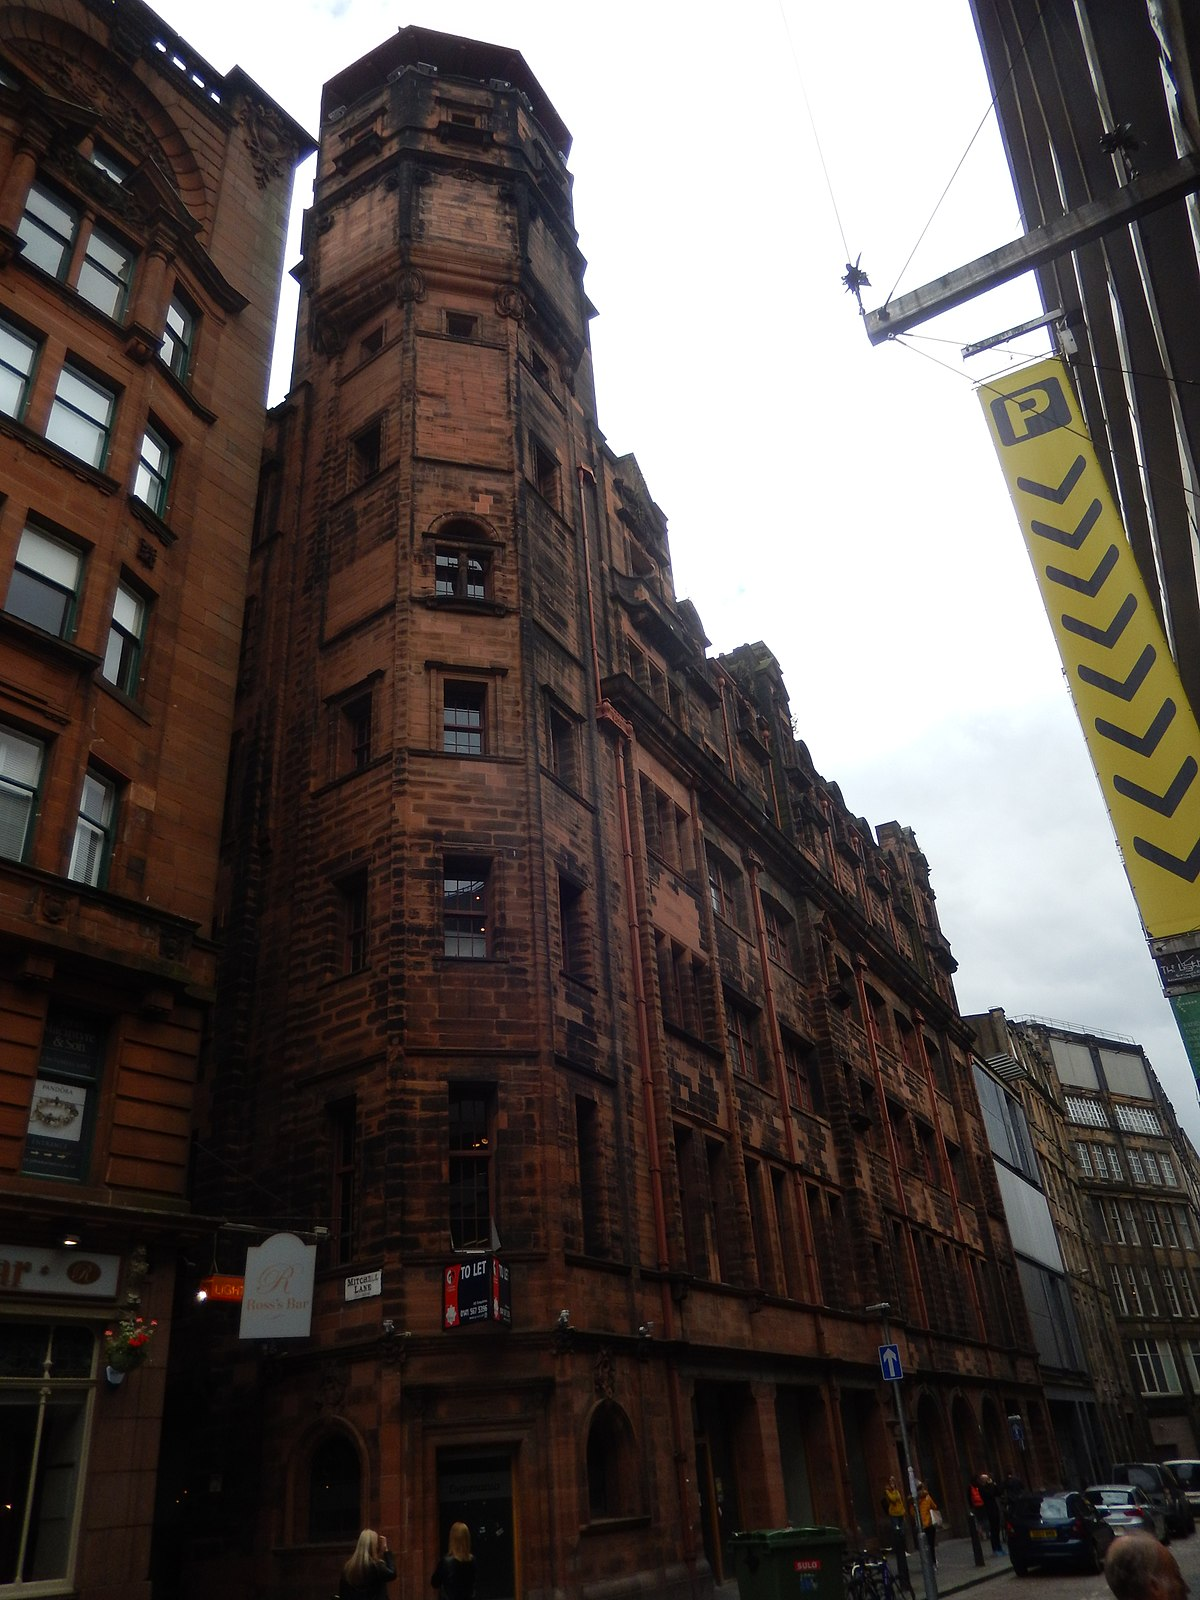 The Lighthouse Glasgow Wikipedia